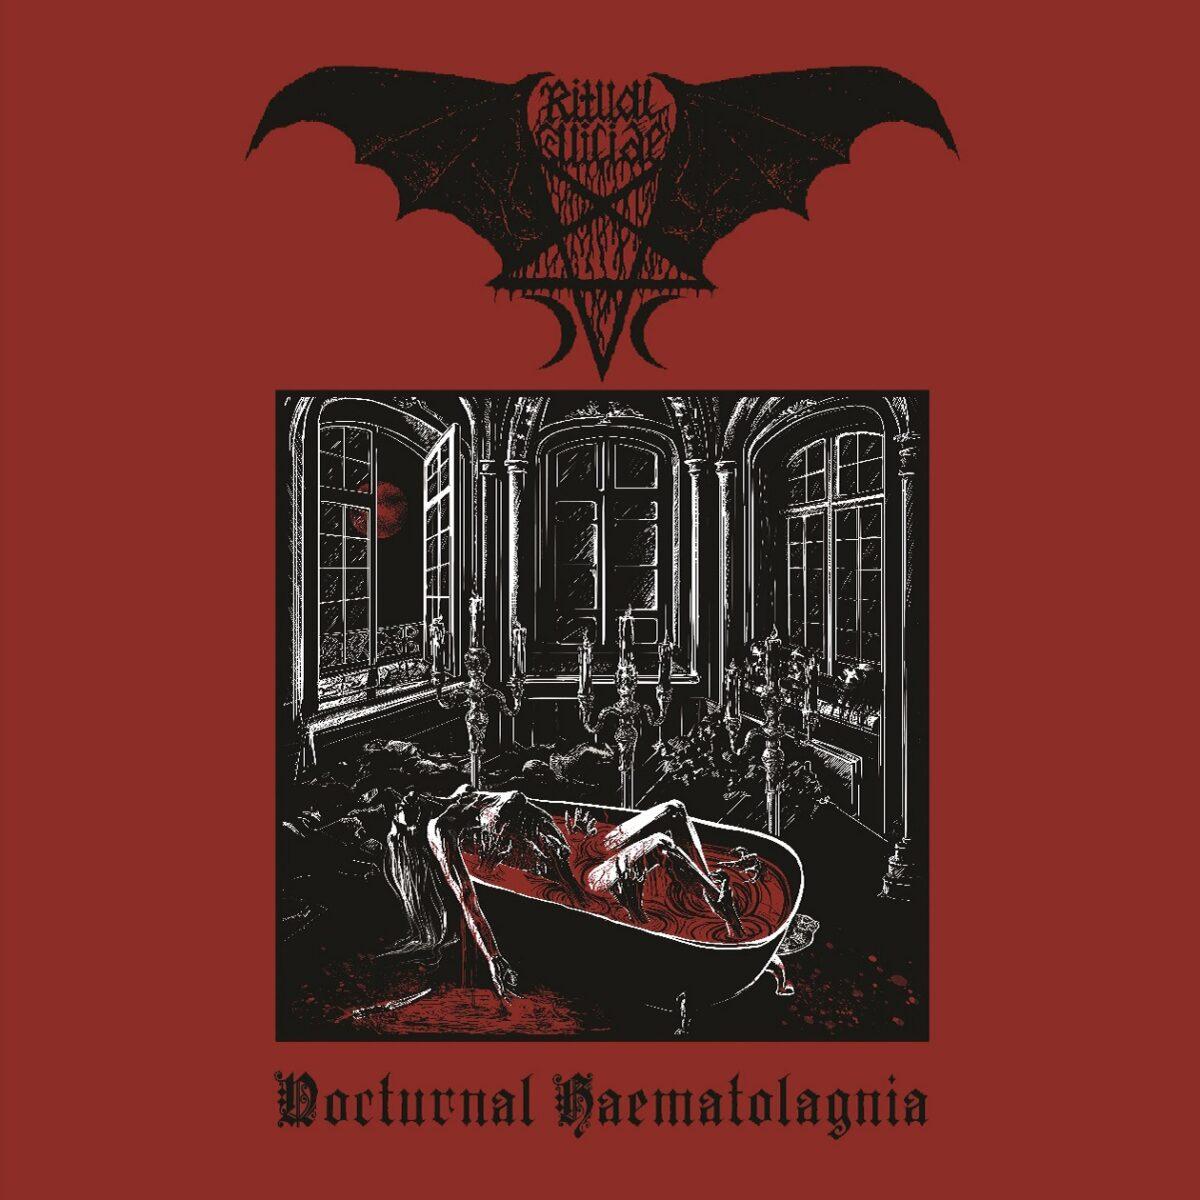 album-premiere:-ritual-suicide-–-nocturnal-haematolagnia